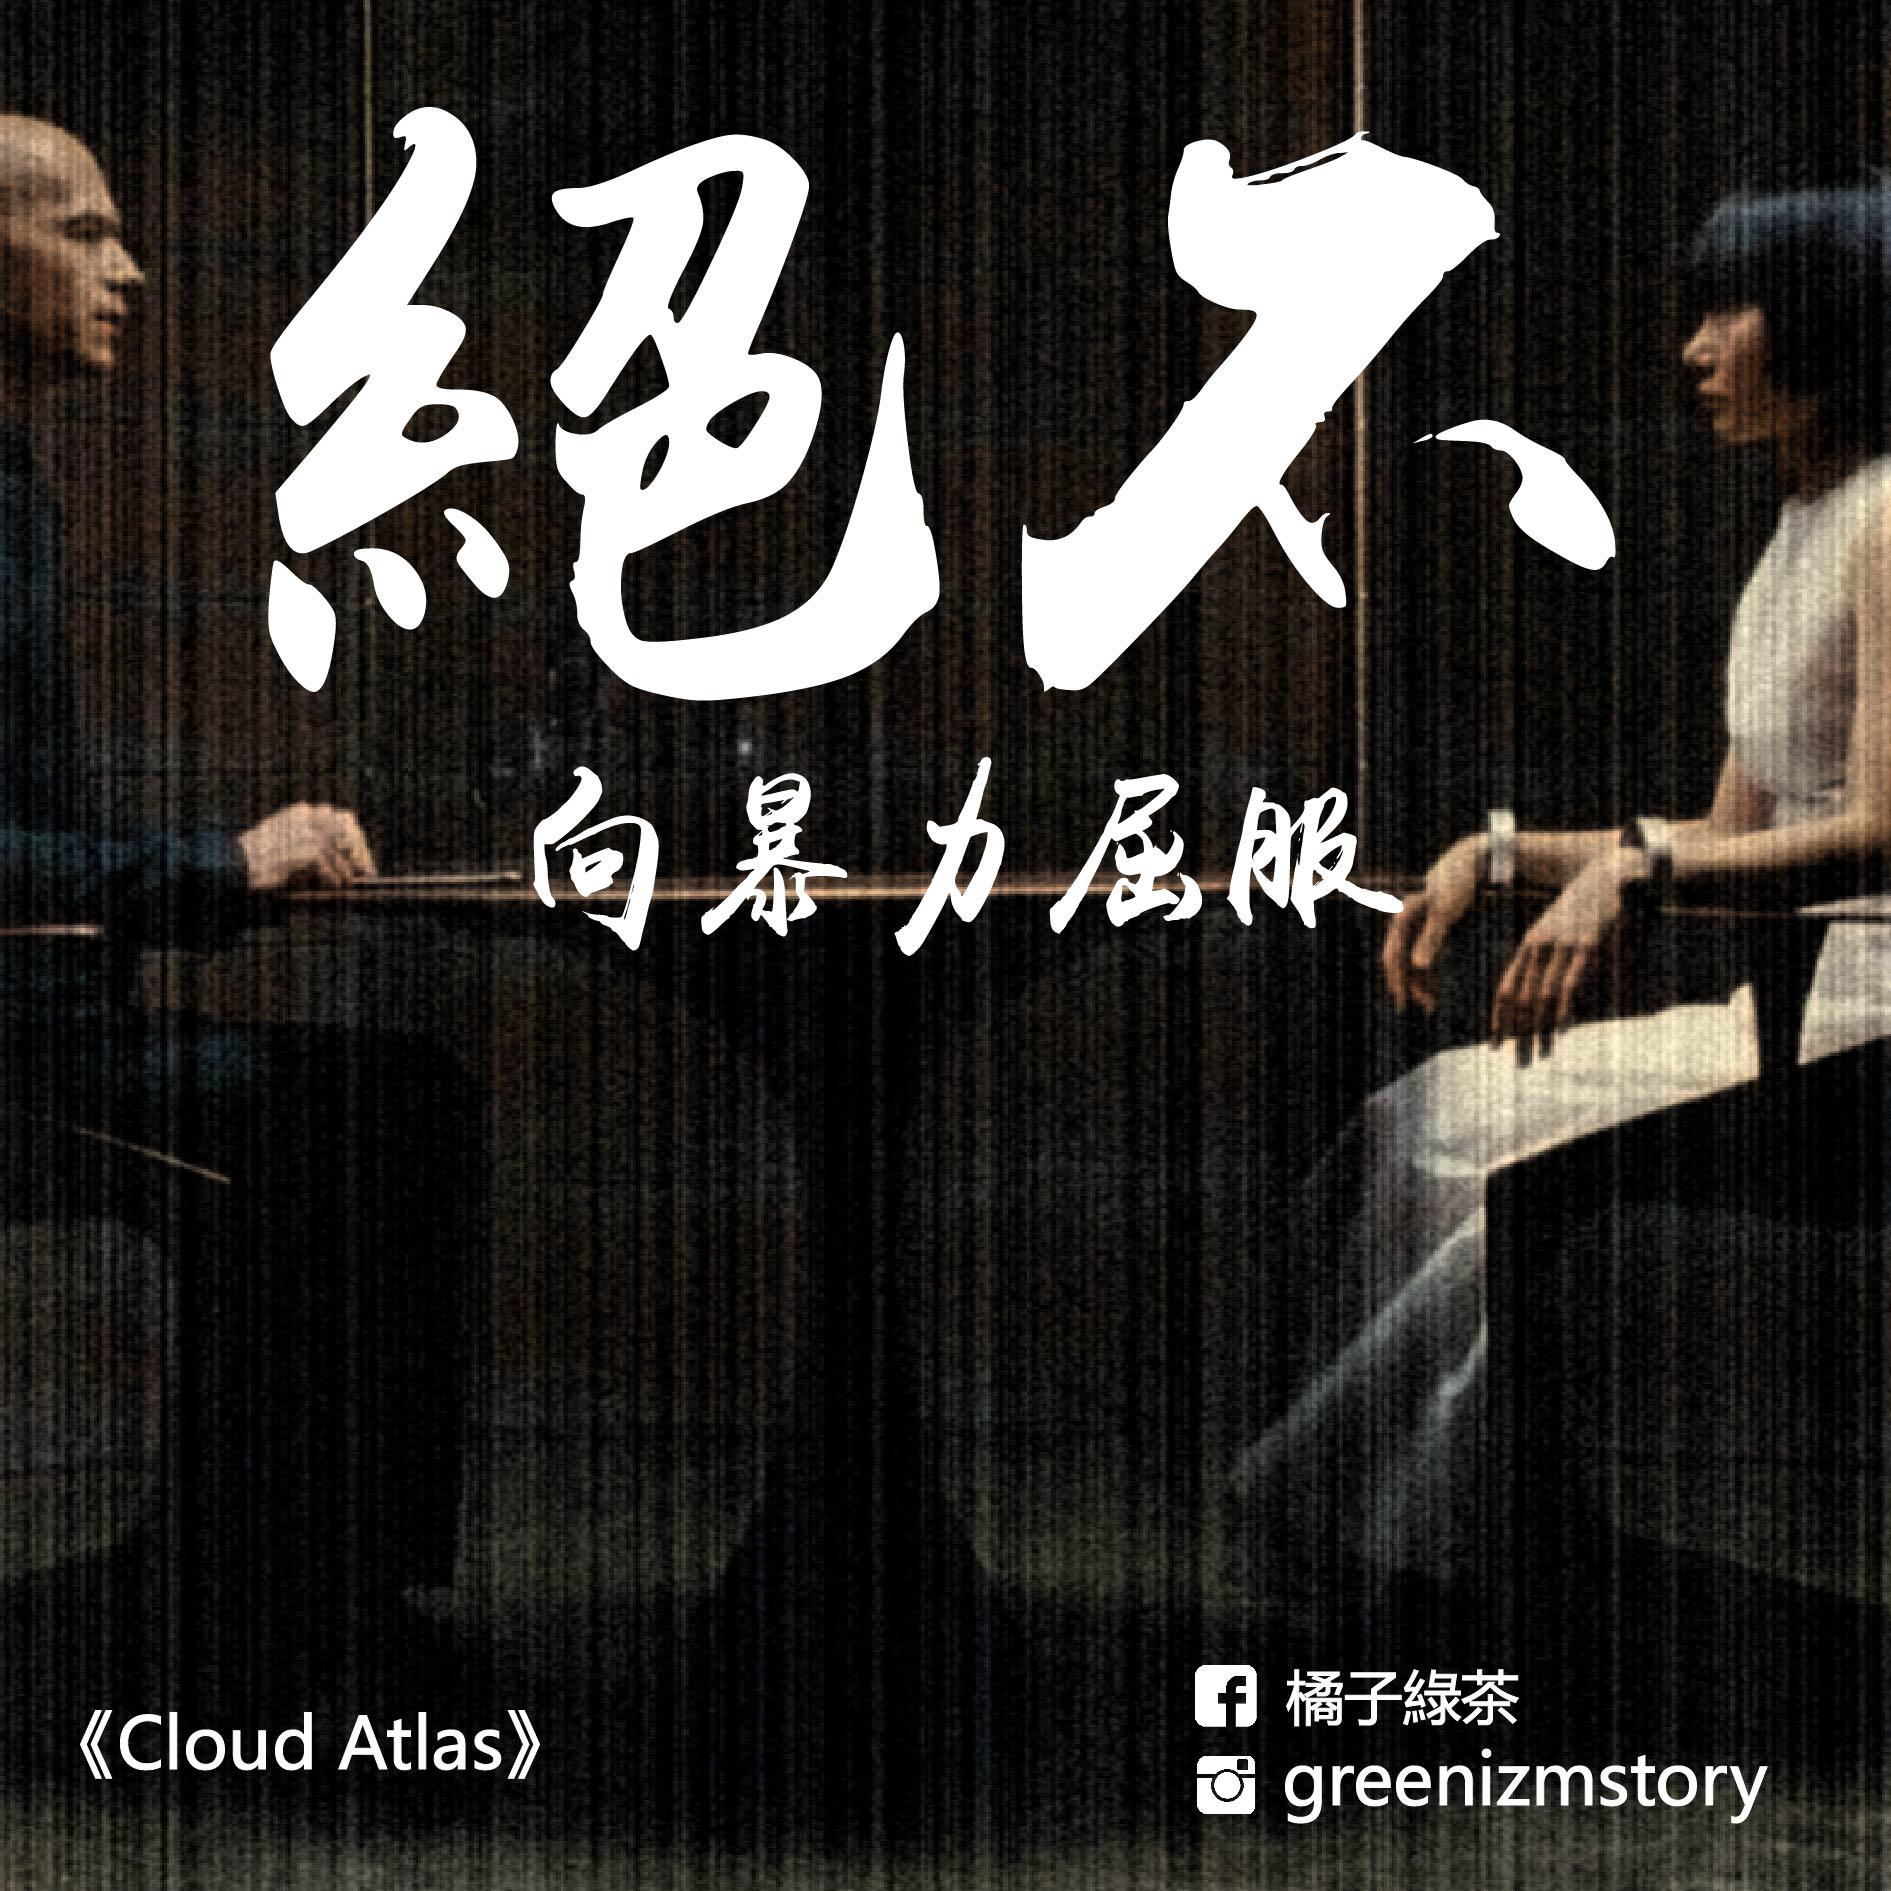 《Cloud Atlas 雲圖》含劇透